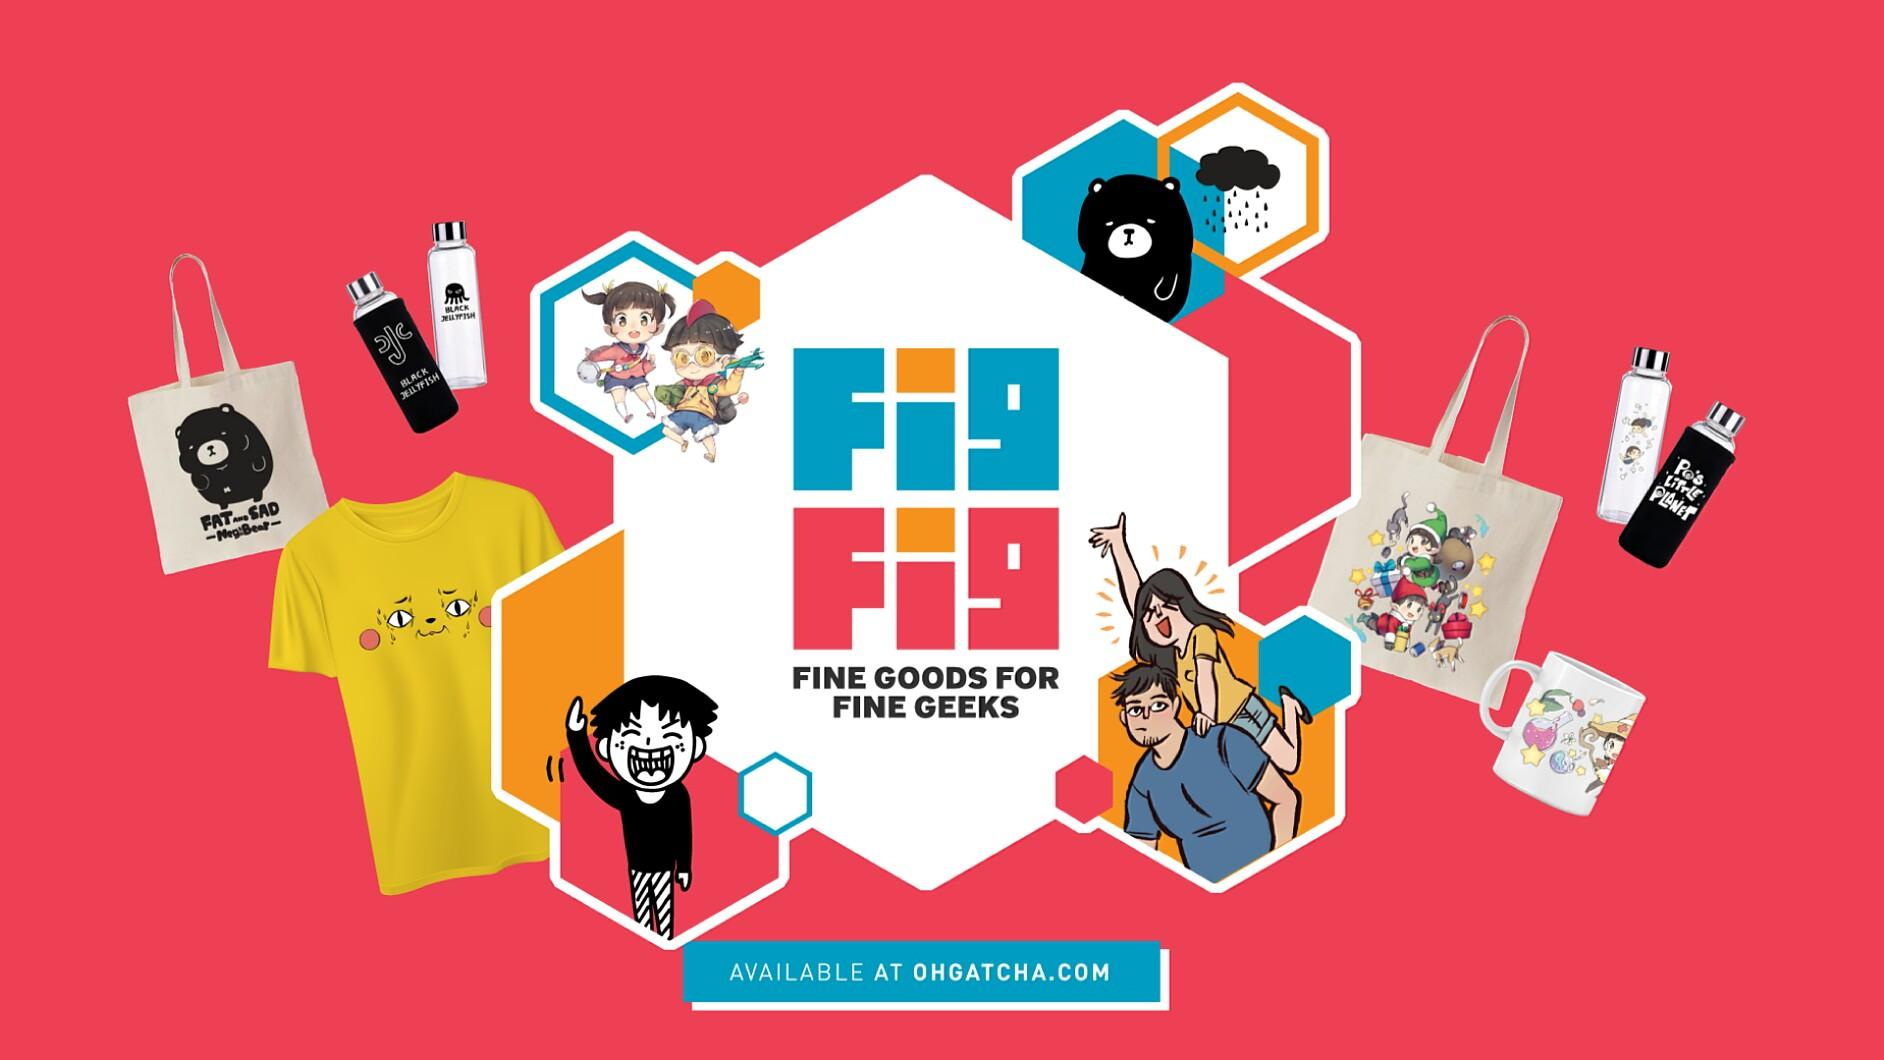 [INFO] FigFig - Fine Goods for Fine Geeks @ Oh! Gatcha